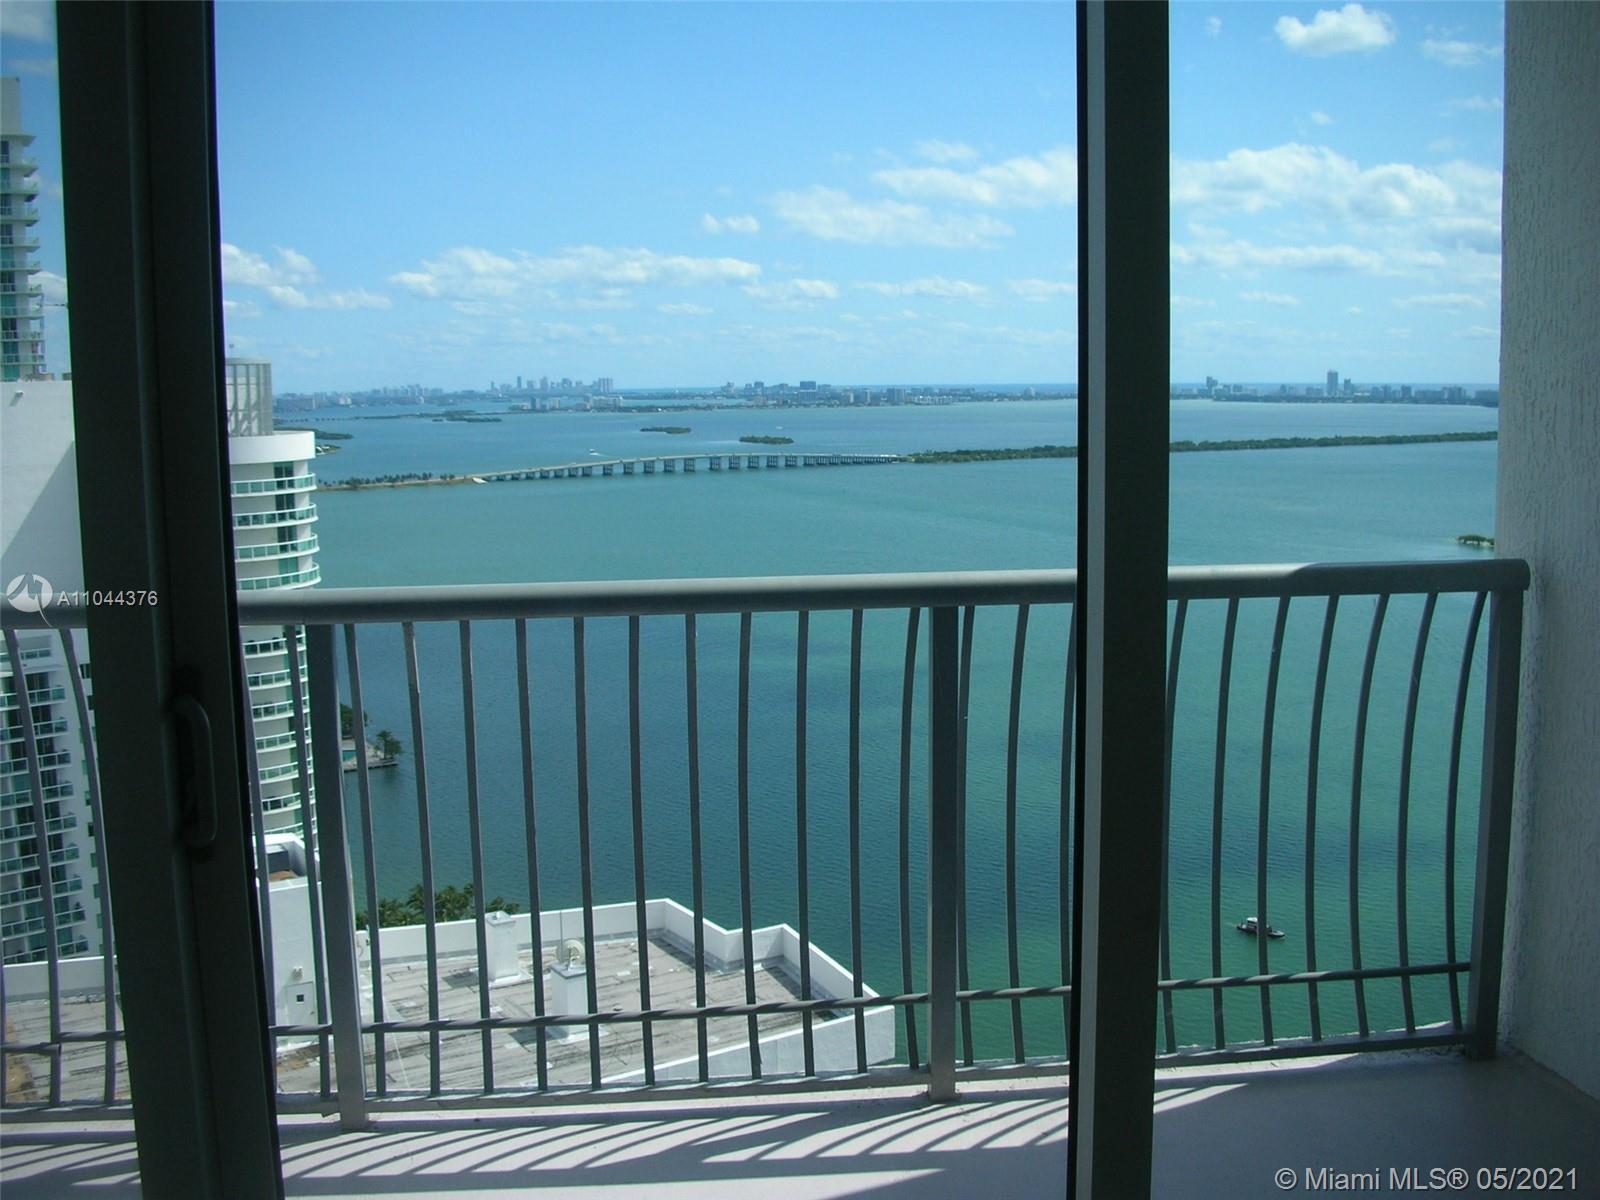 Opera Tower #4503 - 1750 N Bayshore Dr #4503, Miami, FL 33132